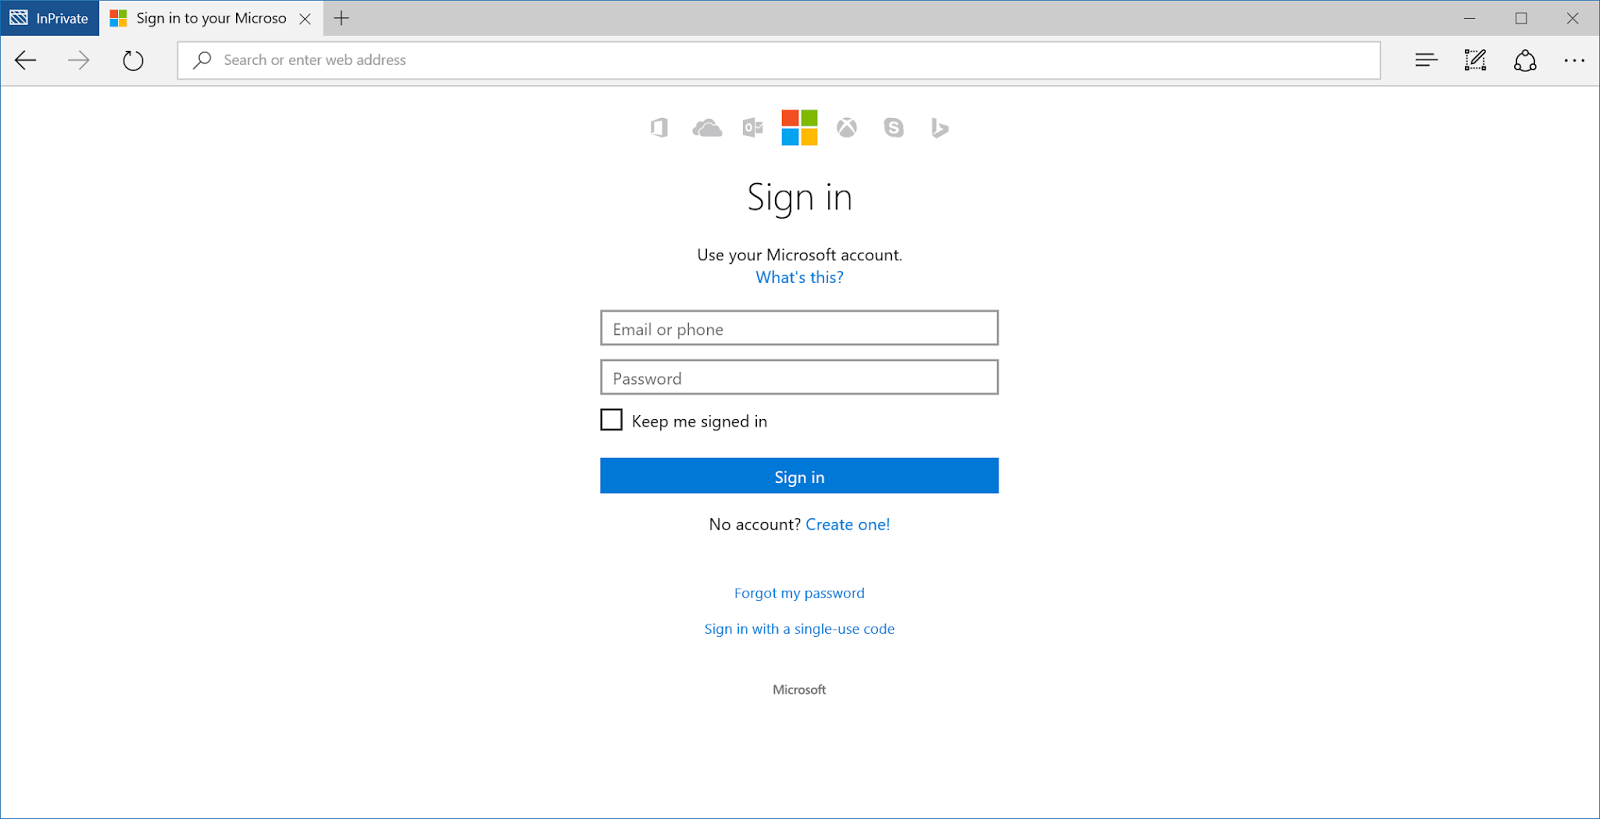 Microsoft finally unified their login screen